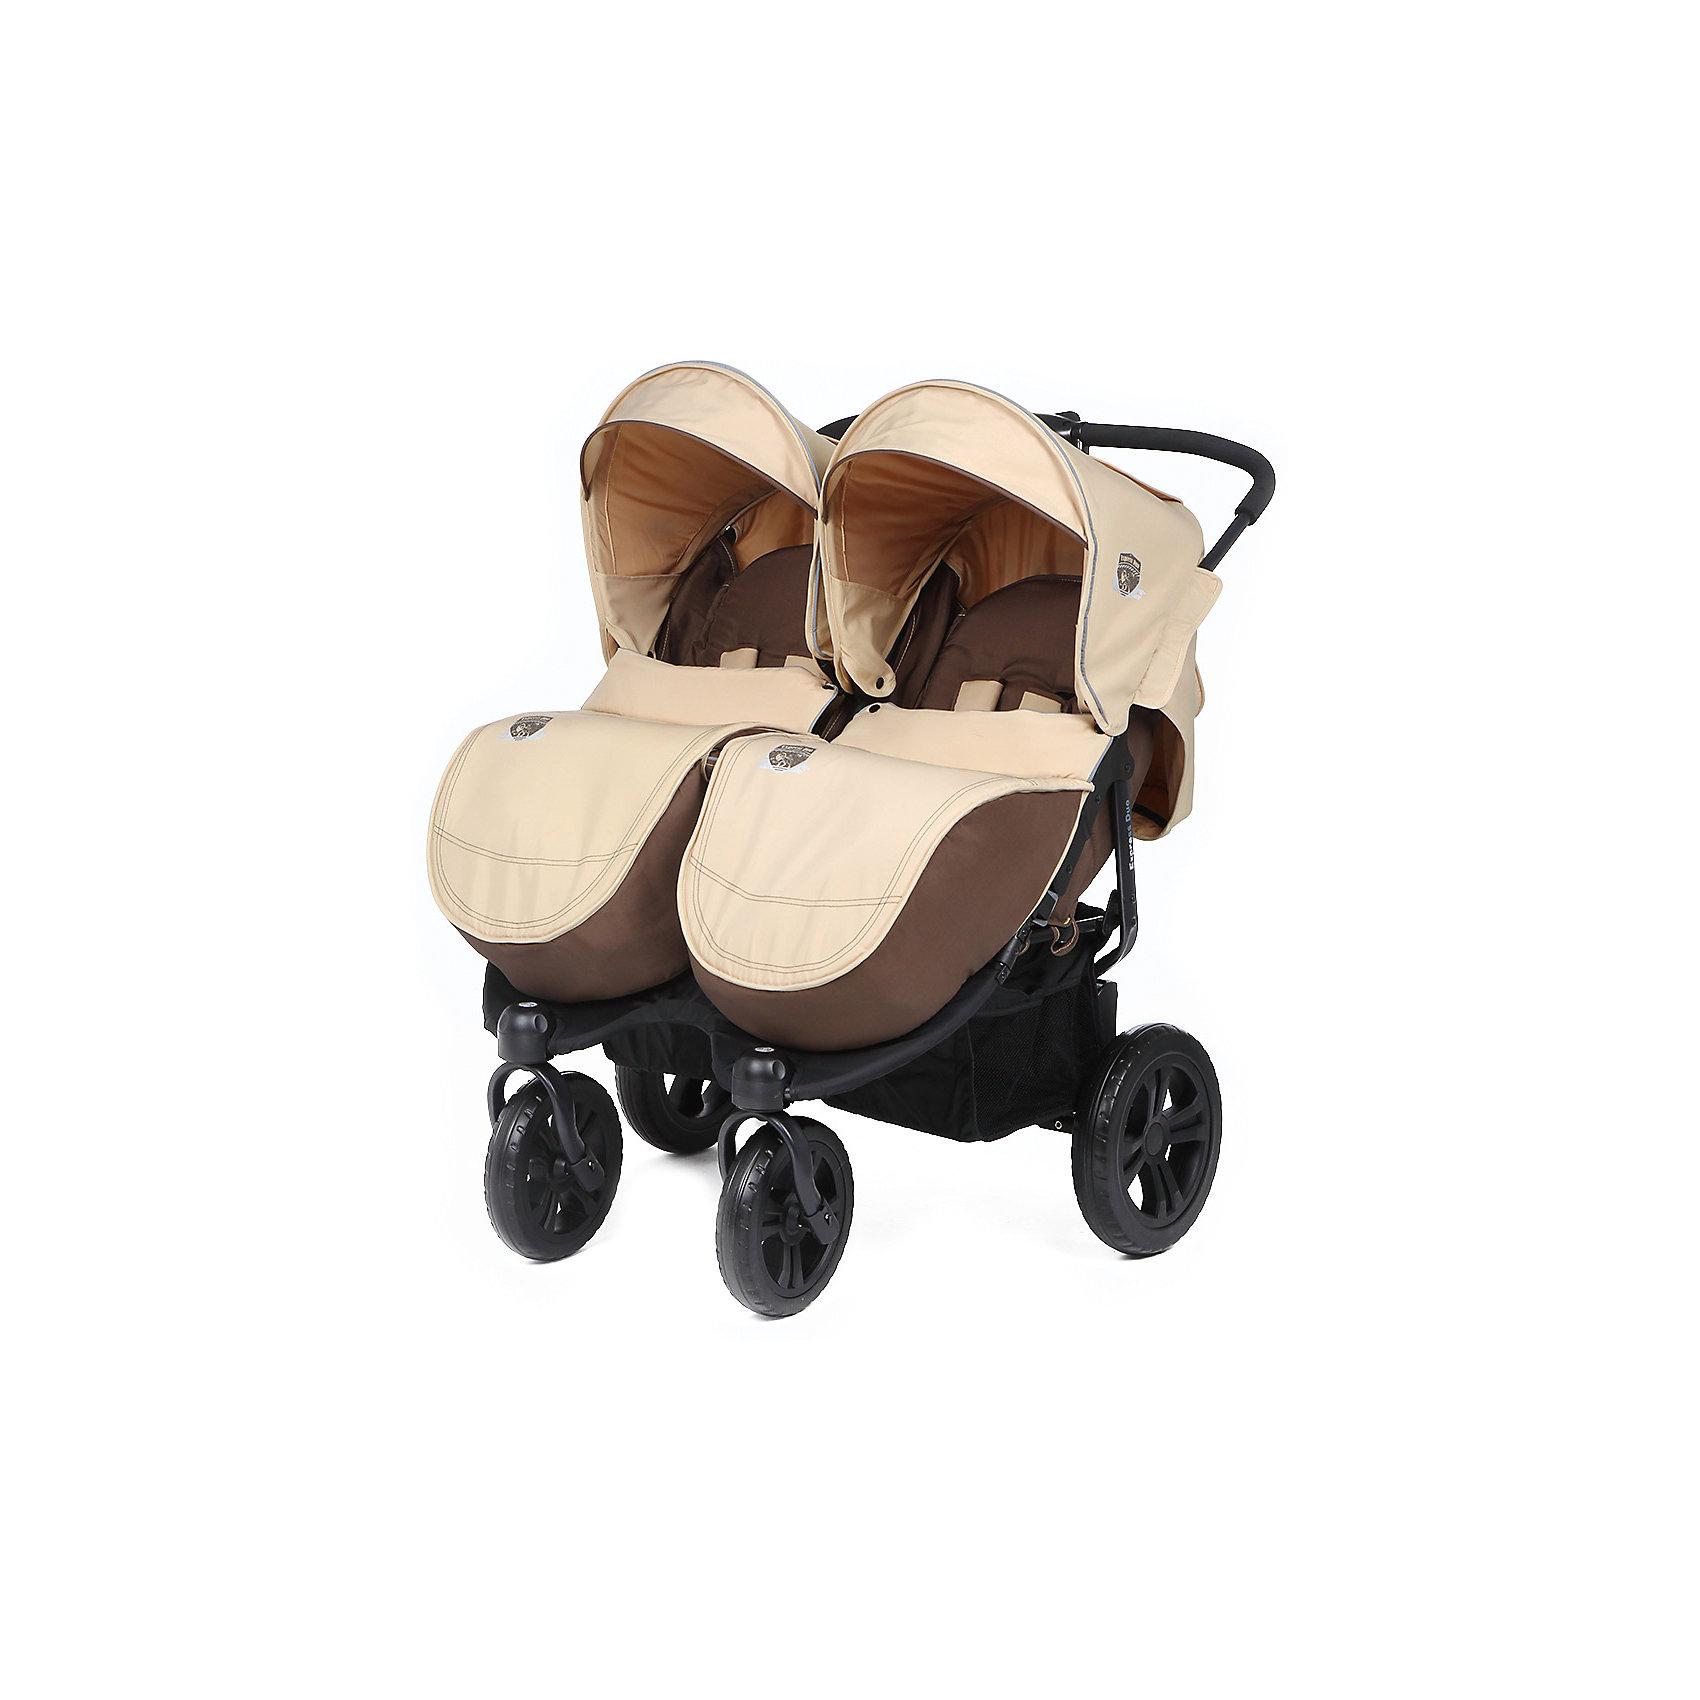 Прогулочная коляска для двойни ExspressDuo, Mobility One, бежевый от myToys